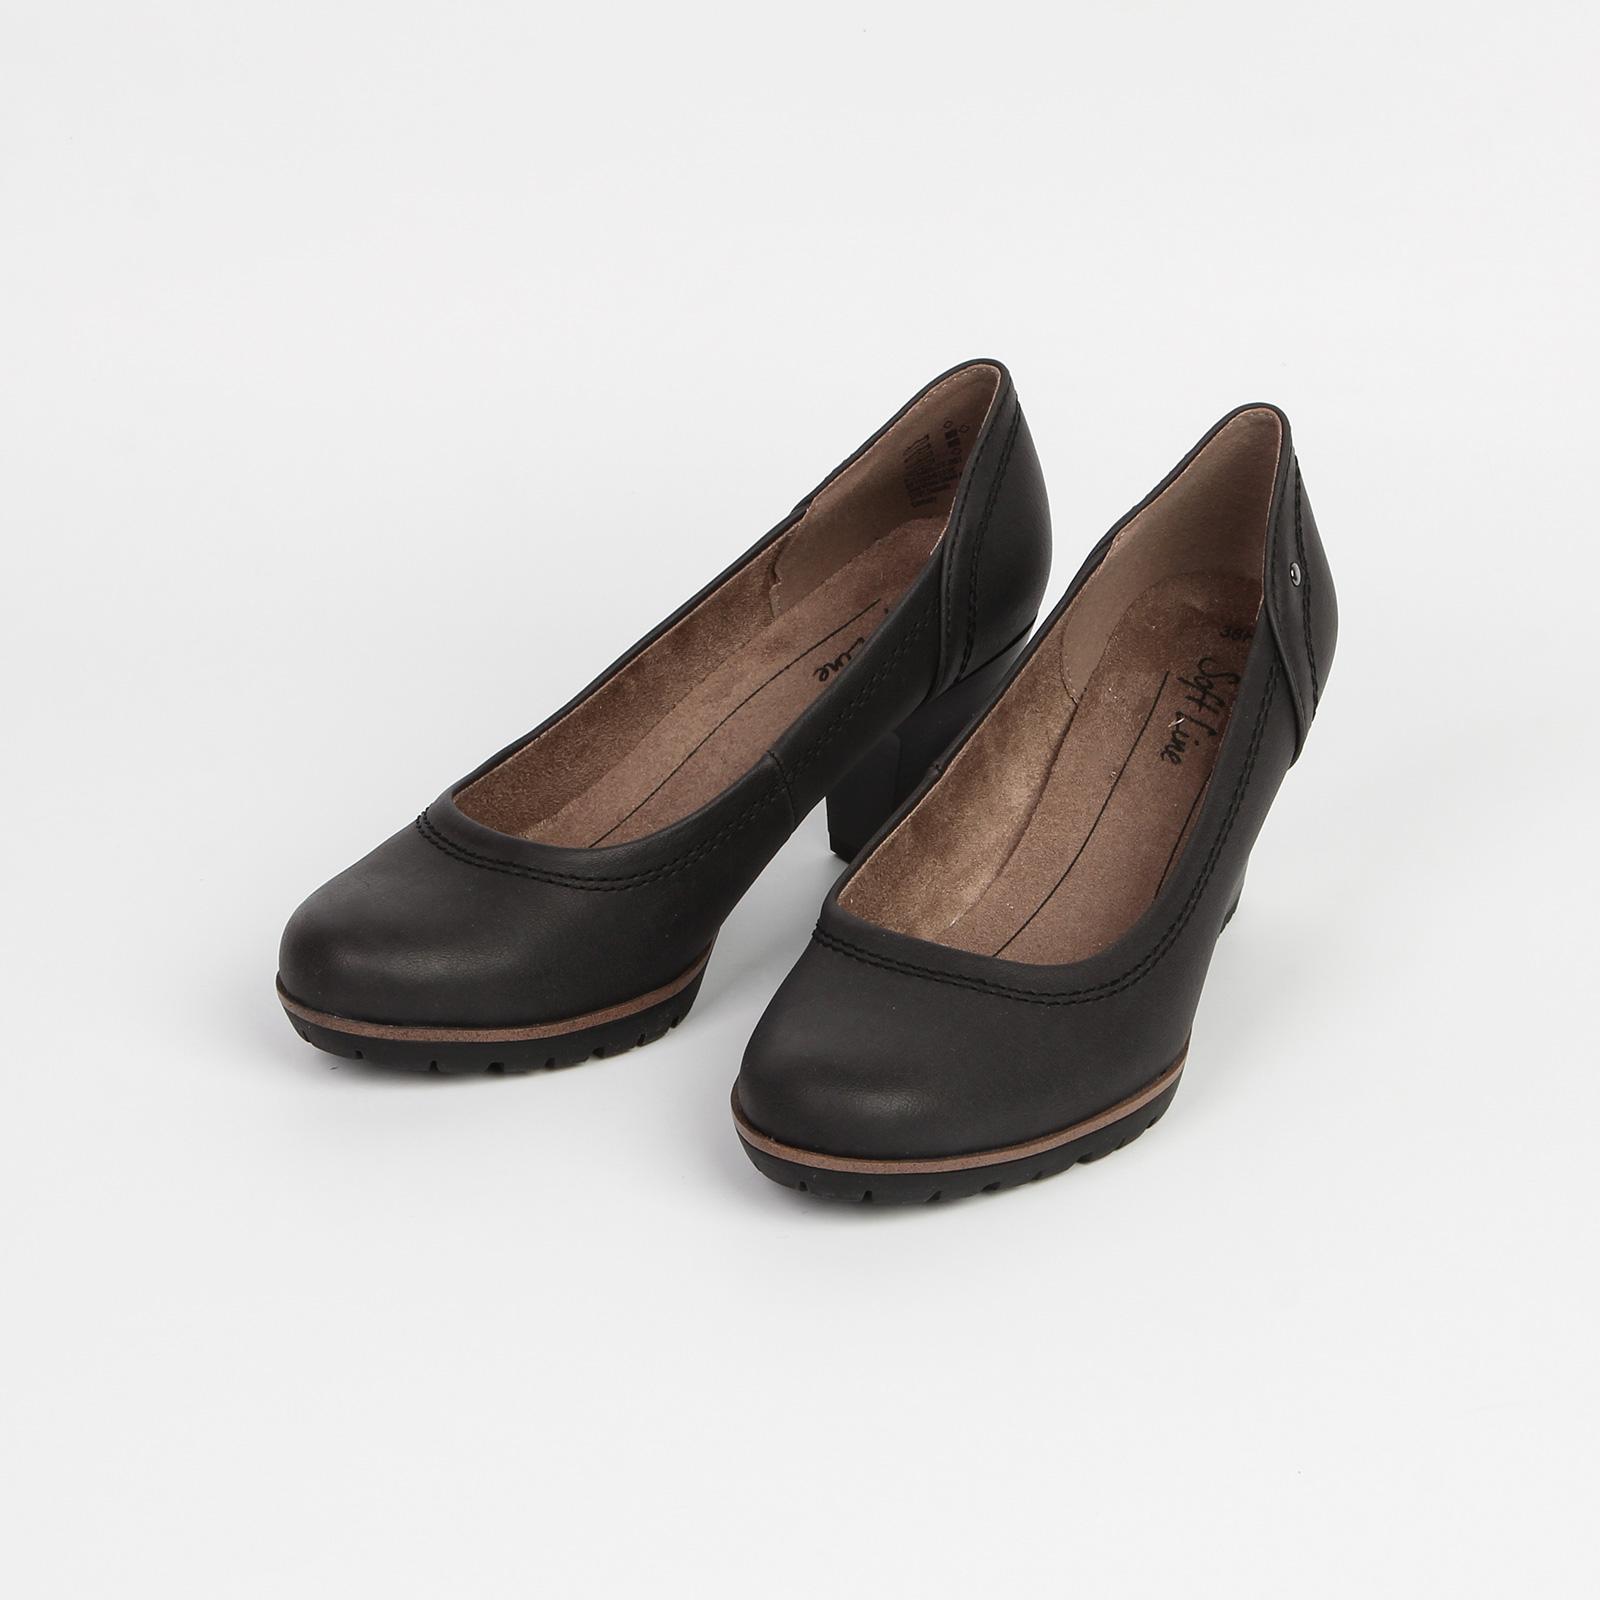 Лодочки женские на рифленой подошве и каблуке